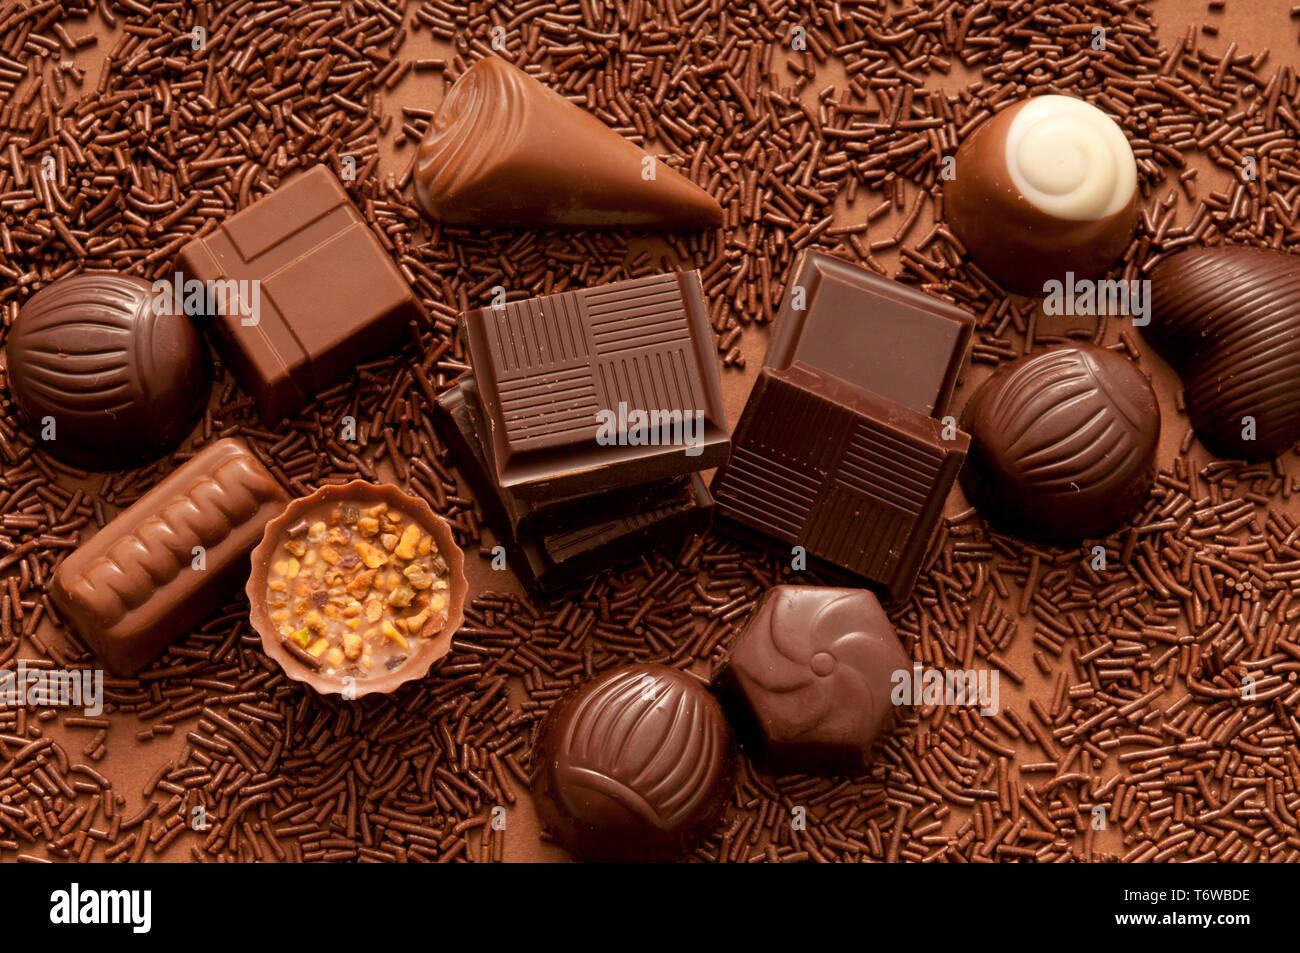 Schokolade Bonbons und Pralinen Stockbild